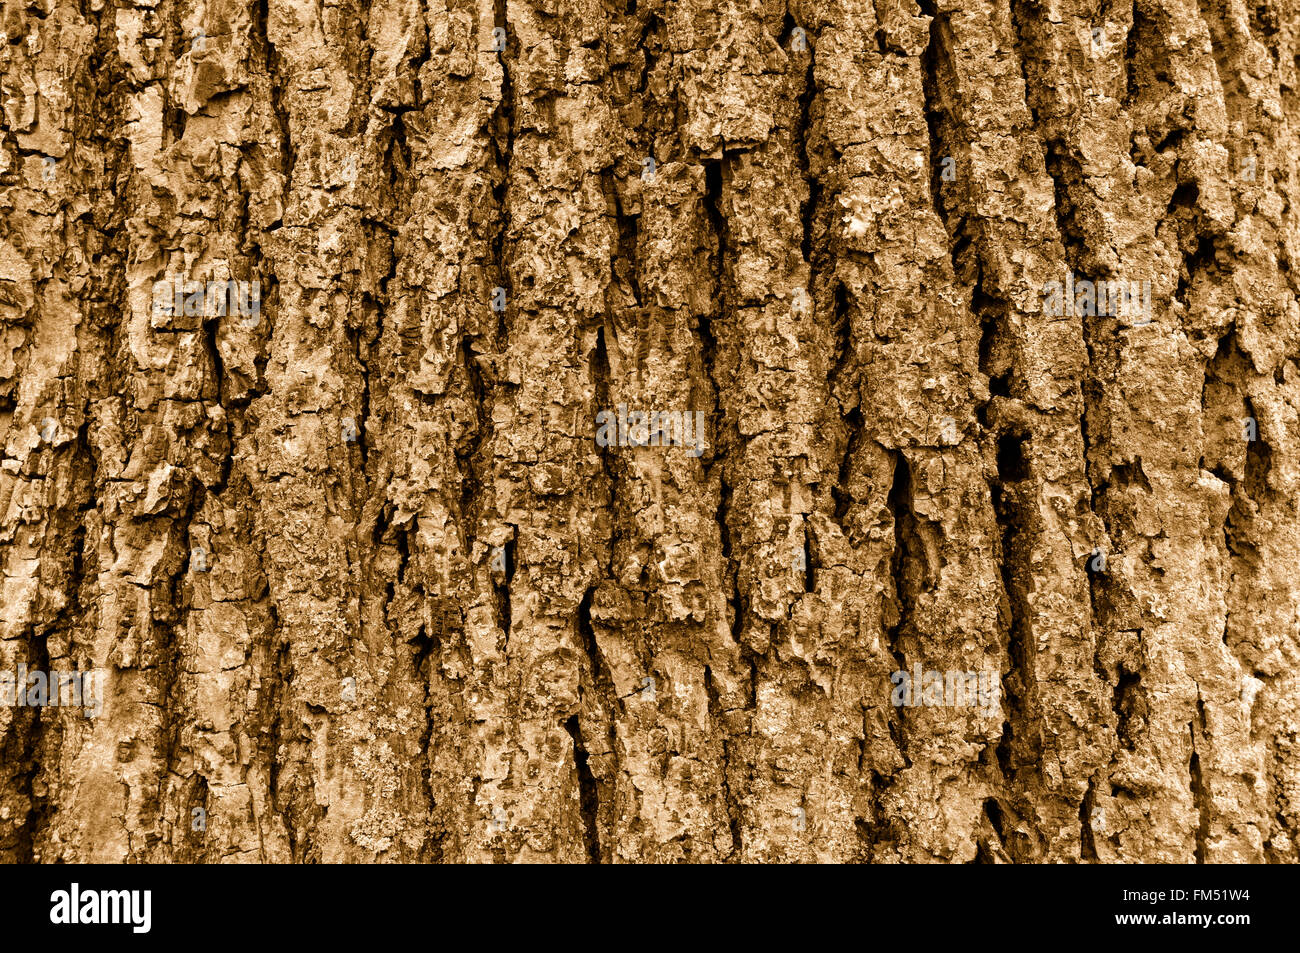 Close up of coarse Himalayan cedar  tree bark in sepia tone - Stock Image